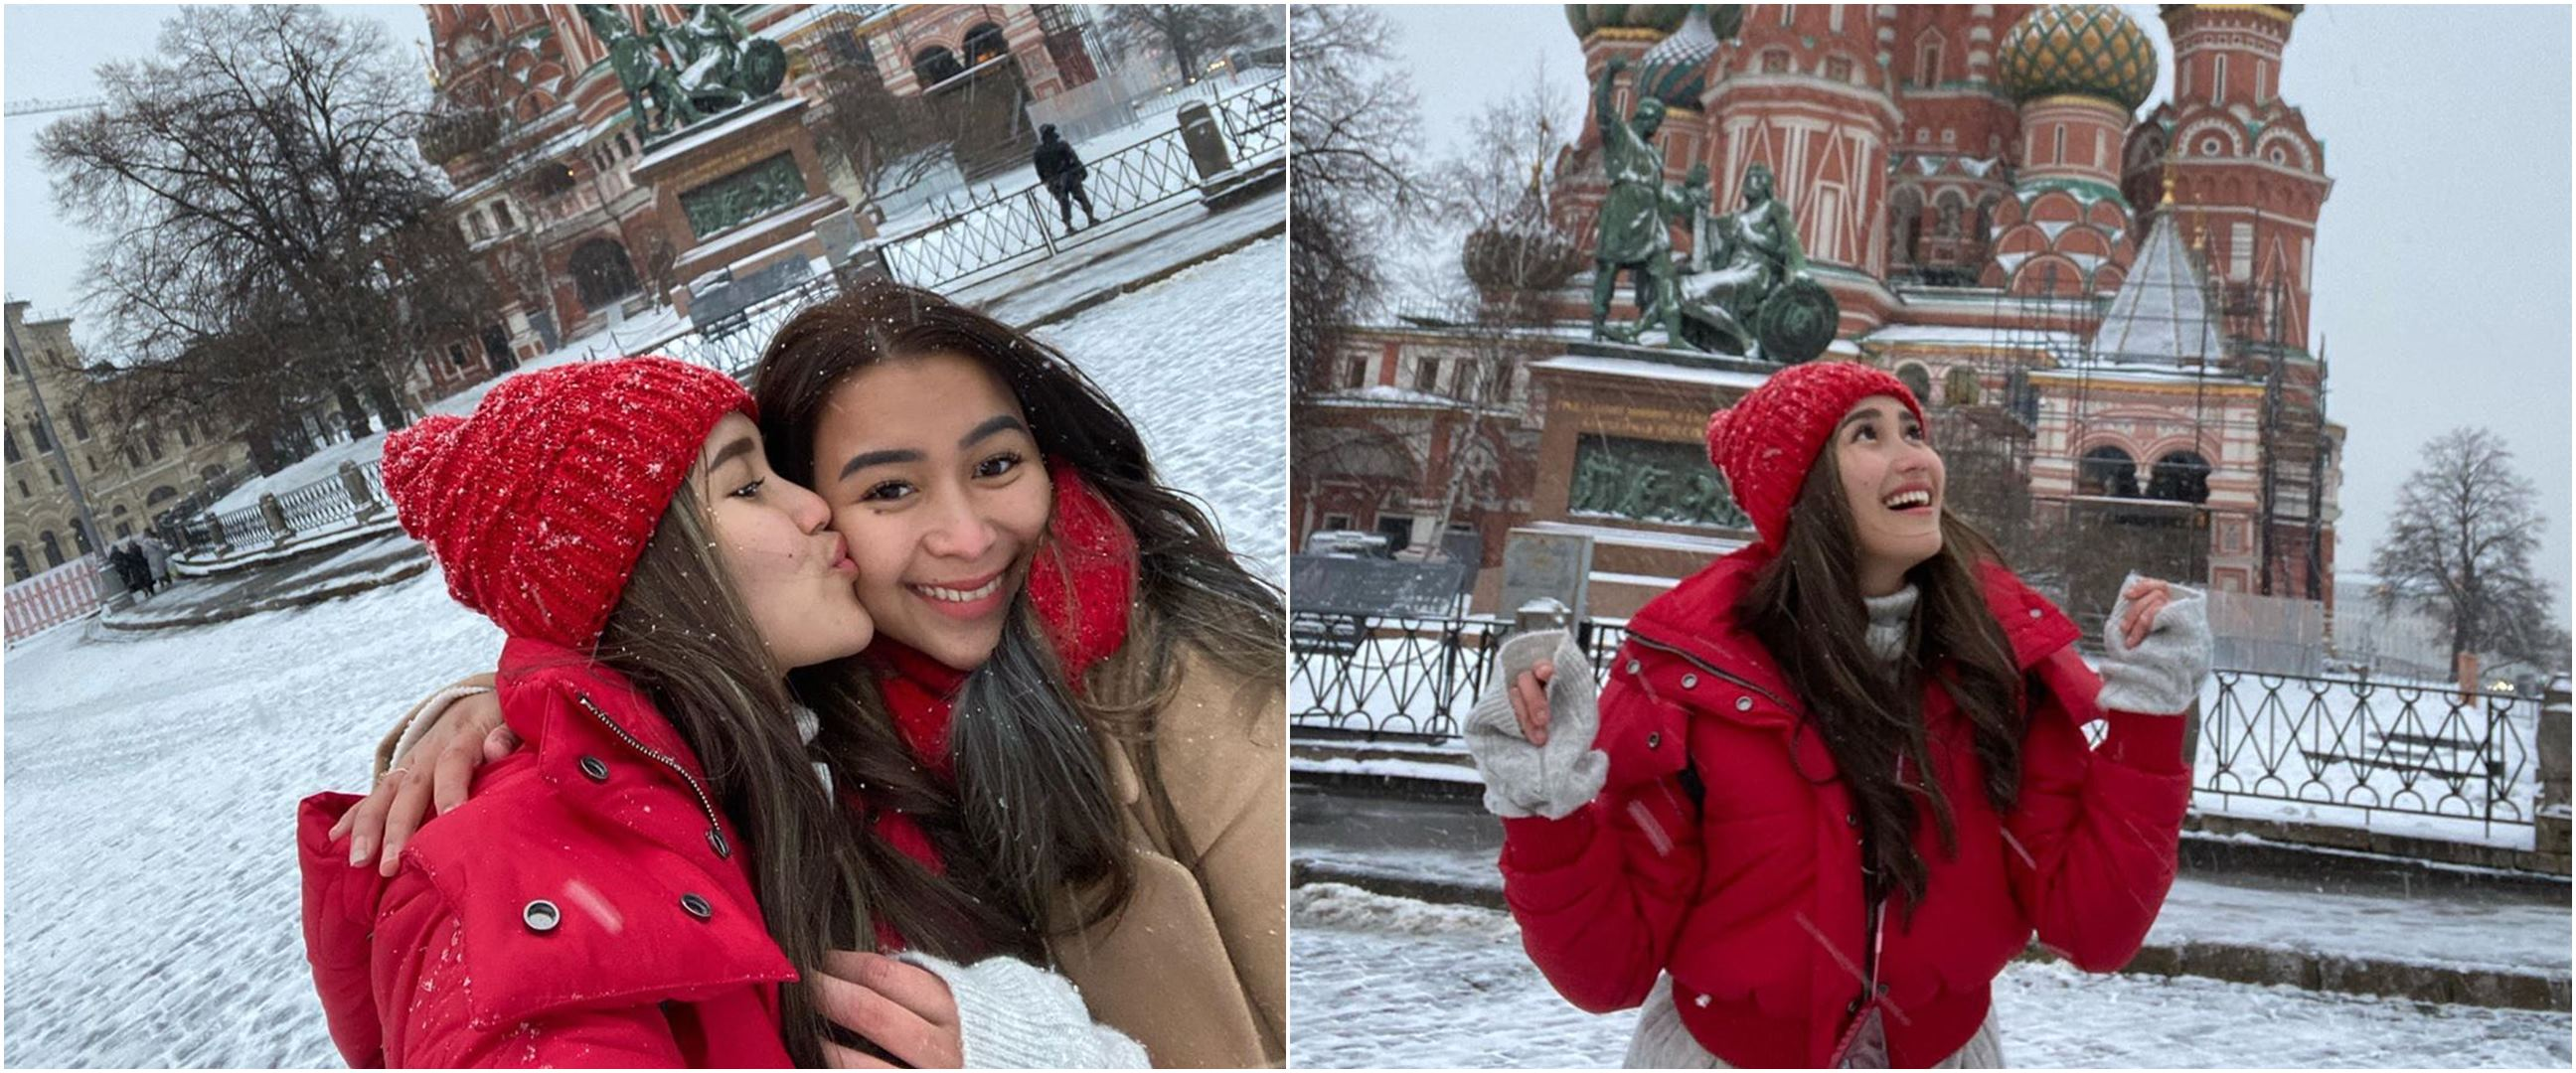 10 Momen Ayu Ting Ting liburan di Moscow, Didi Riyadi nggak ikut?